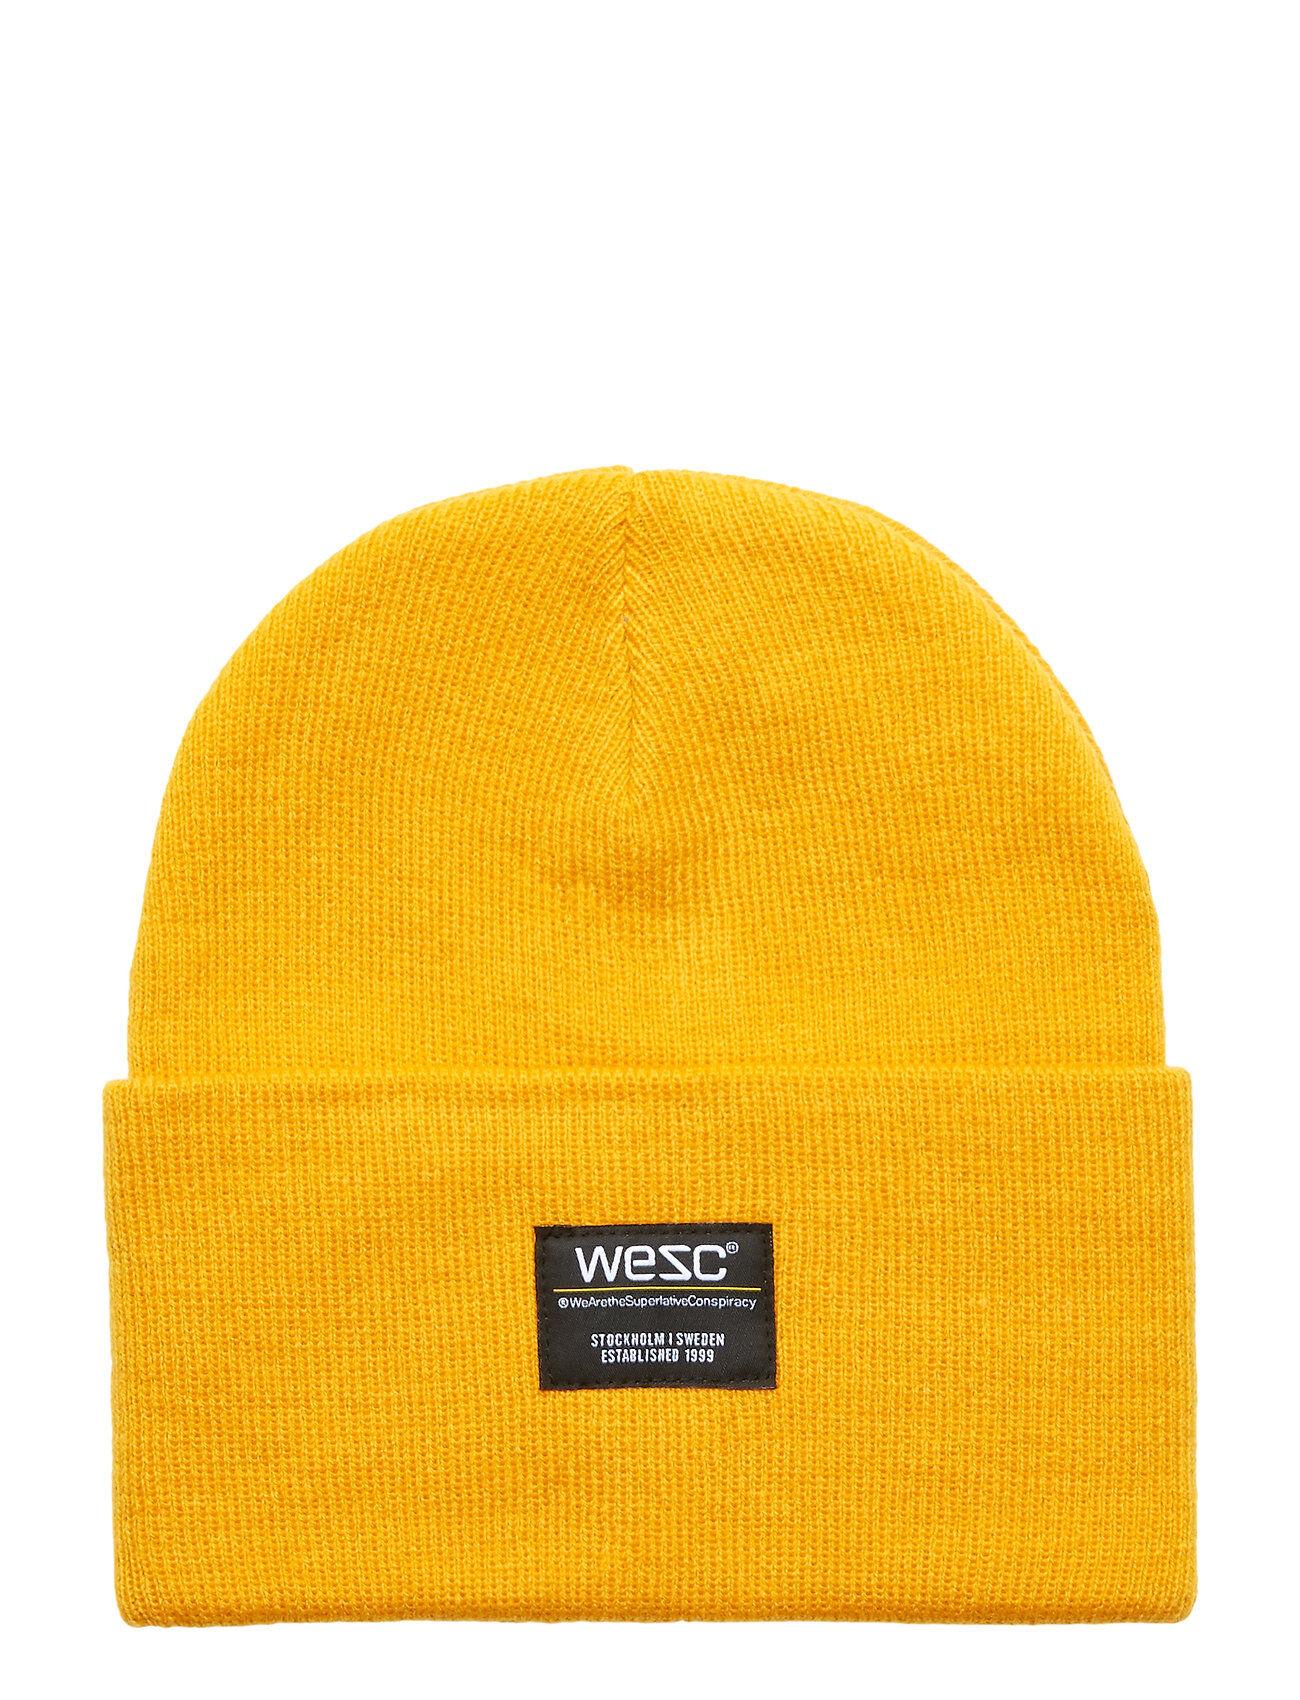 WeSC Puncho Beanie Accessories Headwear Beanies Keltainen WeSC